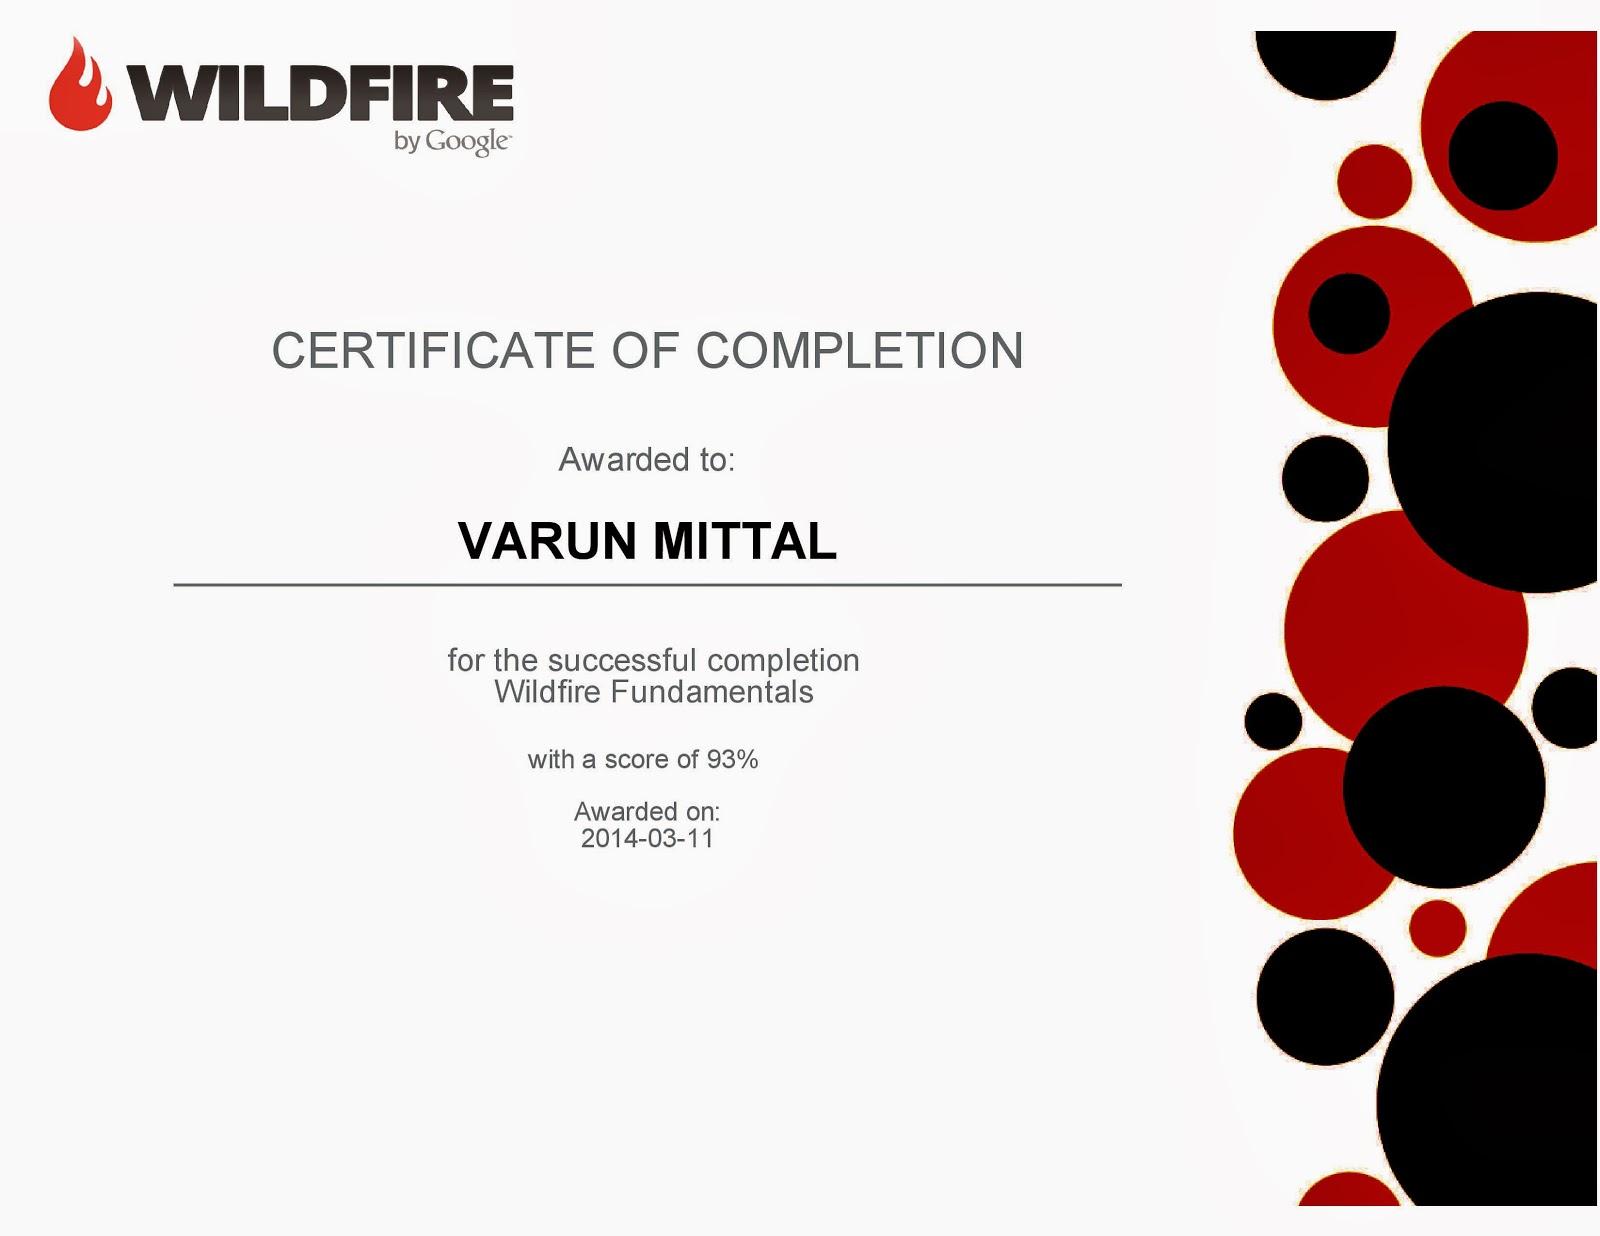 My Certification